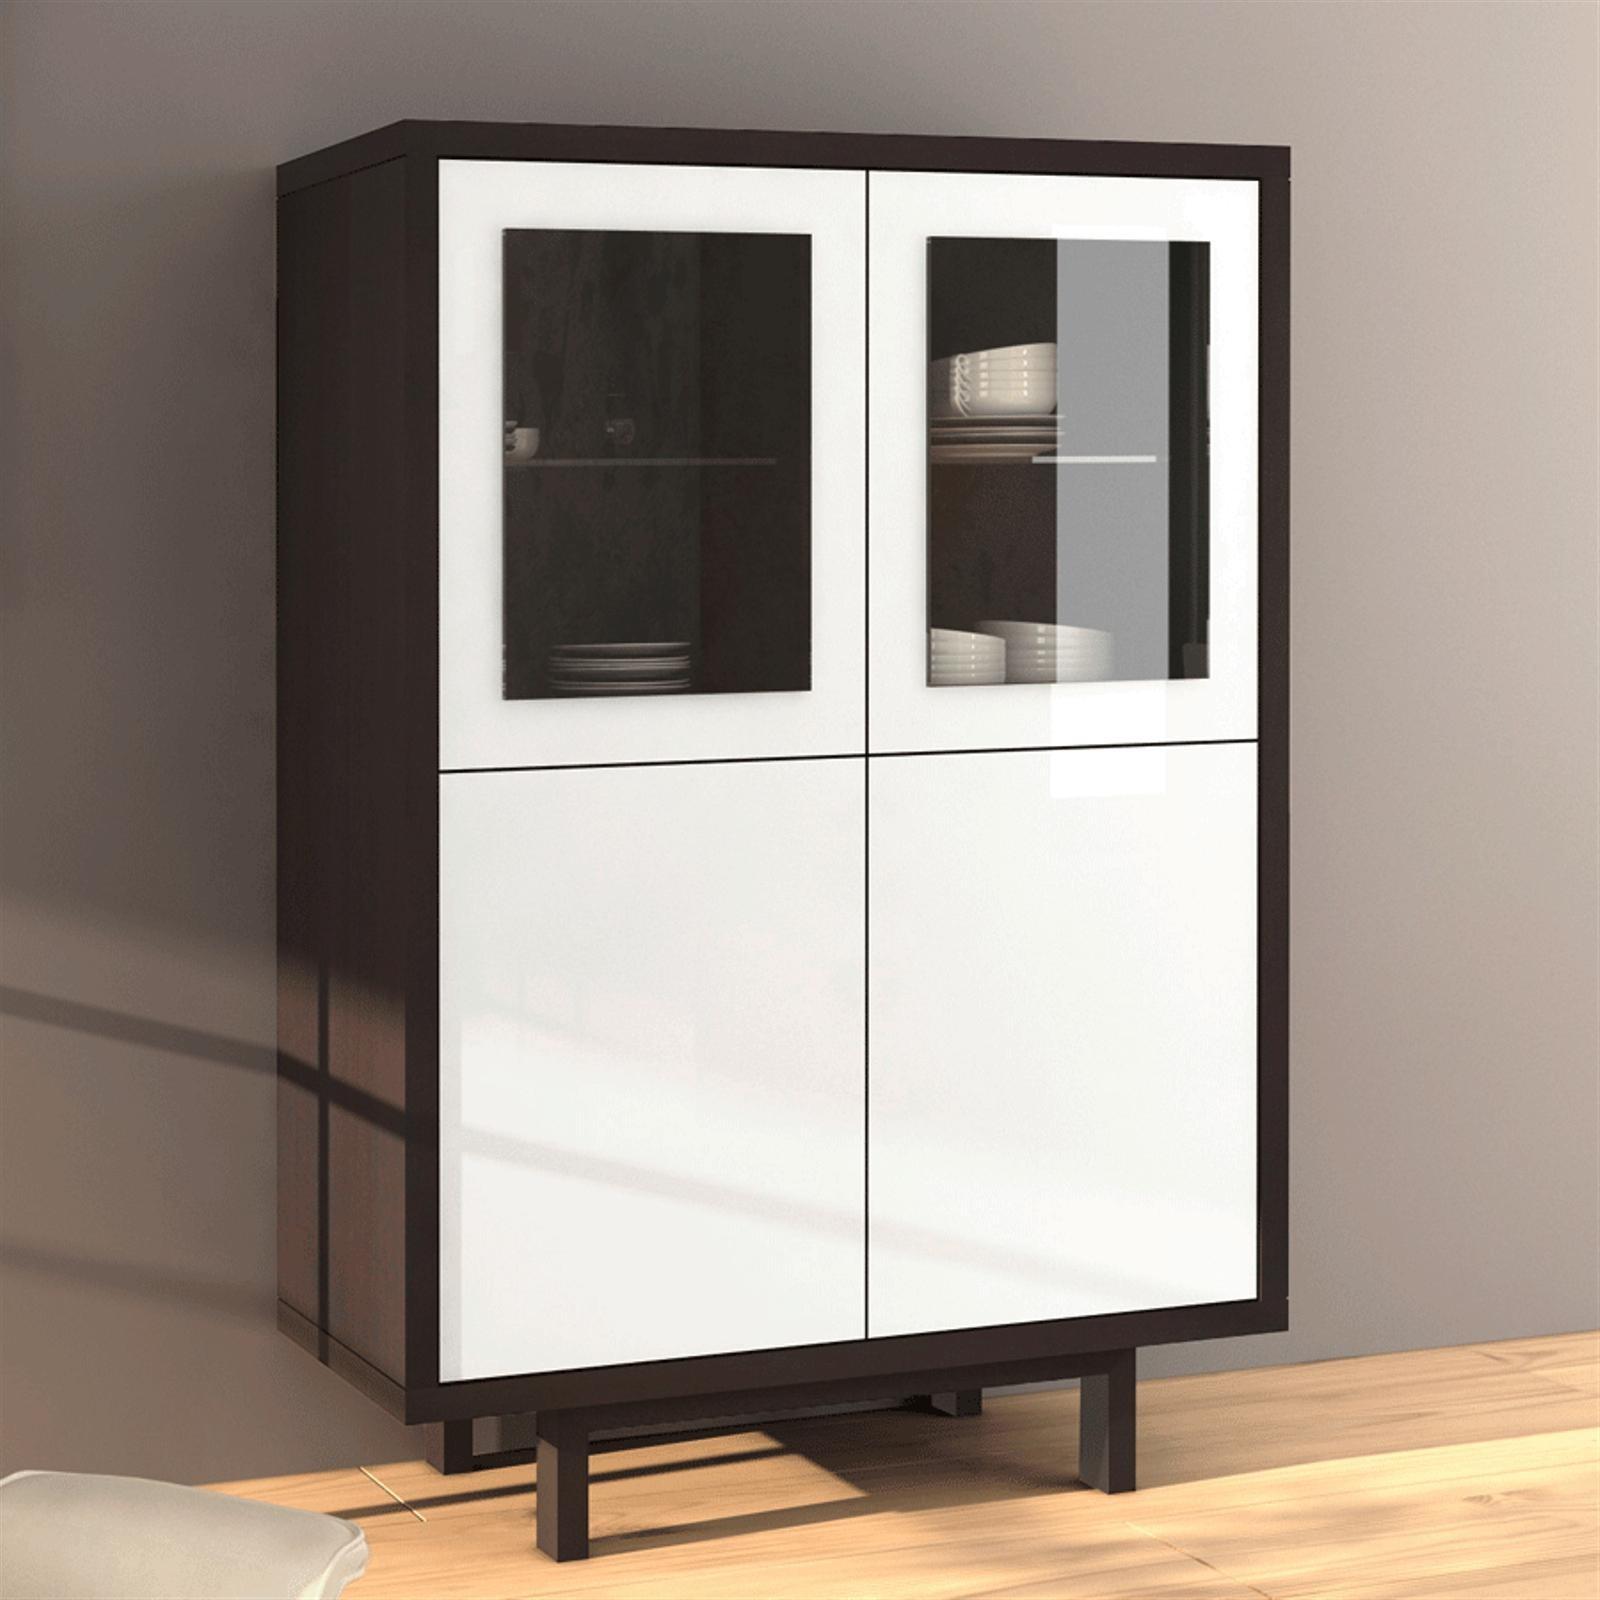 Porte de cuisine en verre porte en verre pour meuble de - Verre pour porte de cuisine ...